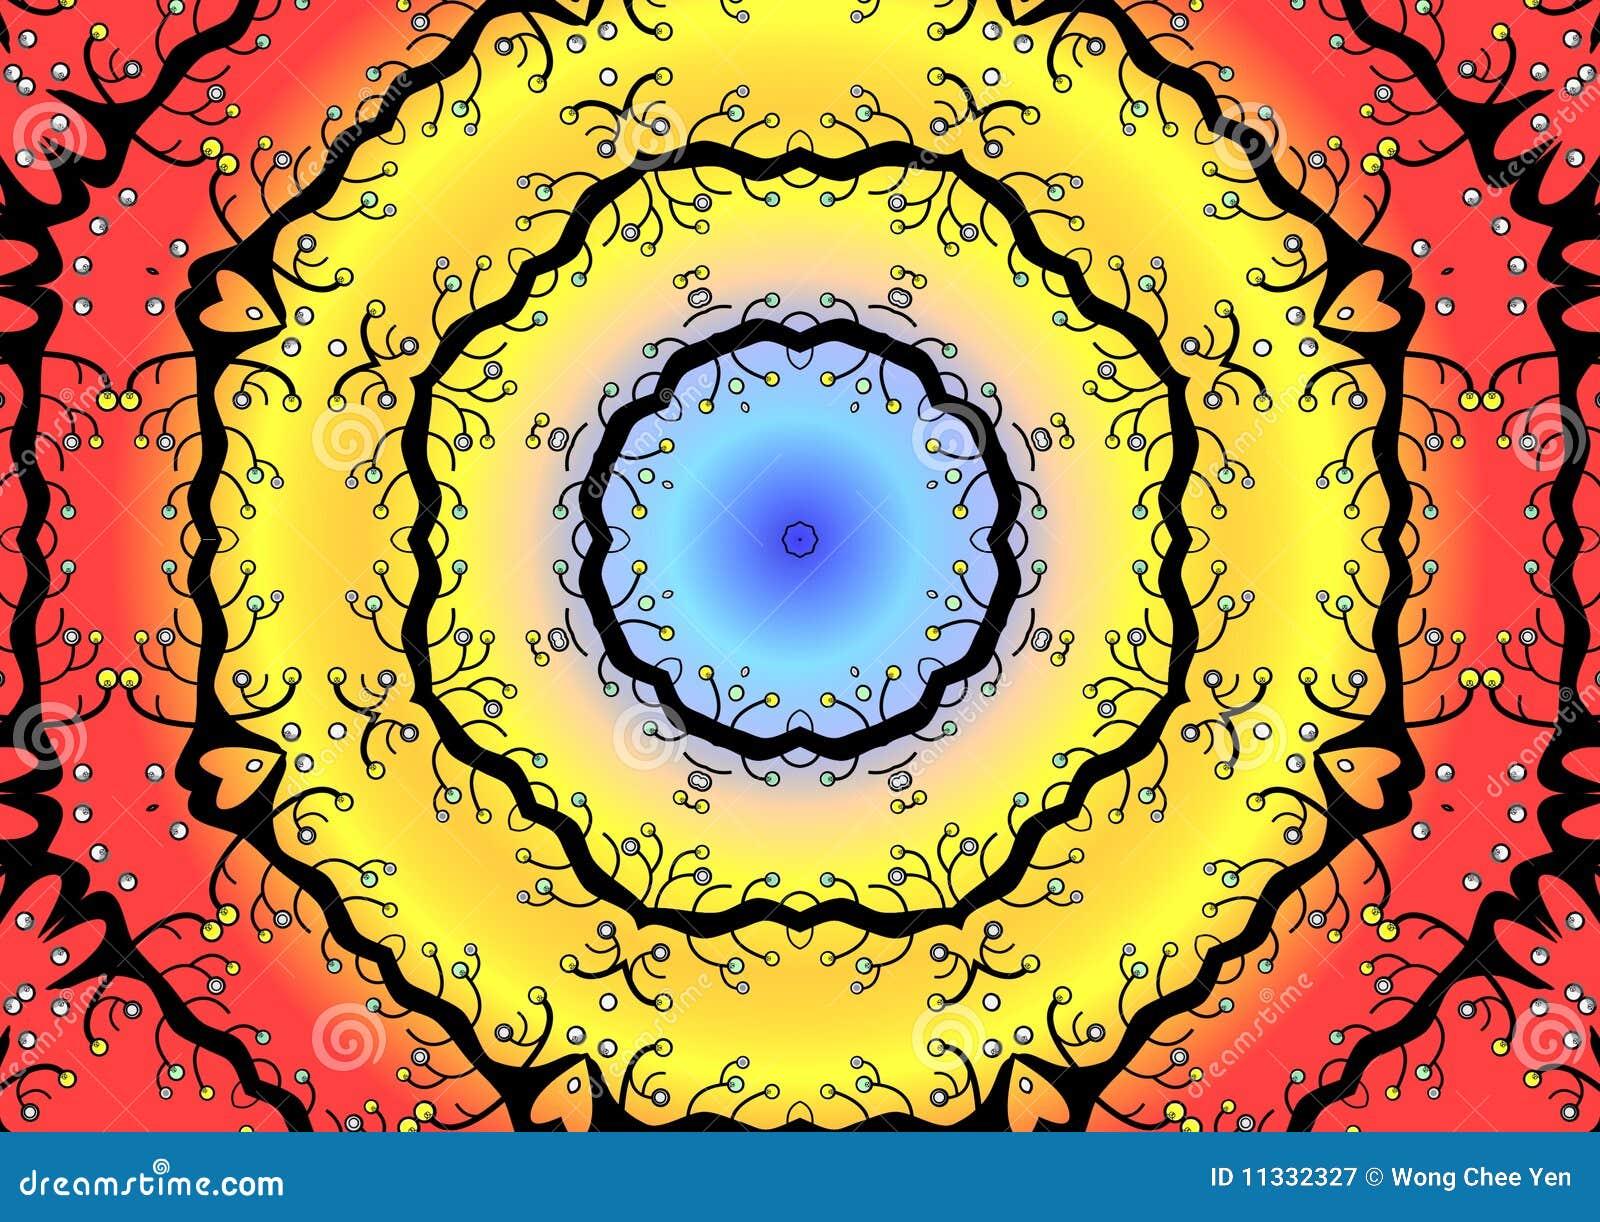 Colorful circular illustration